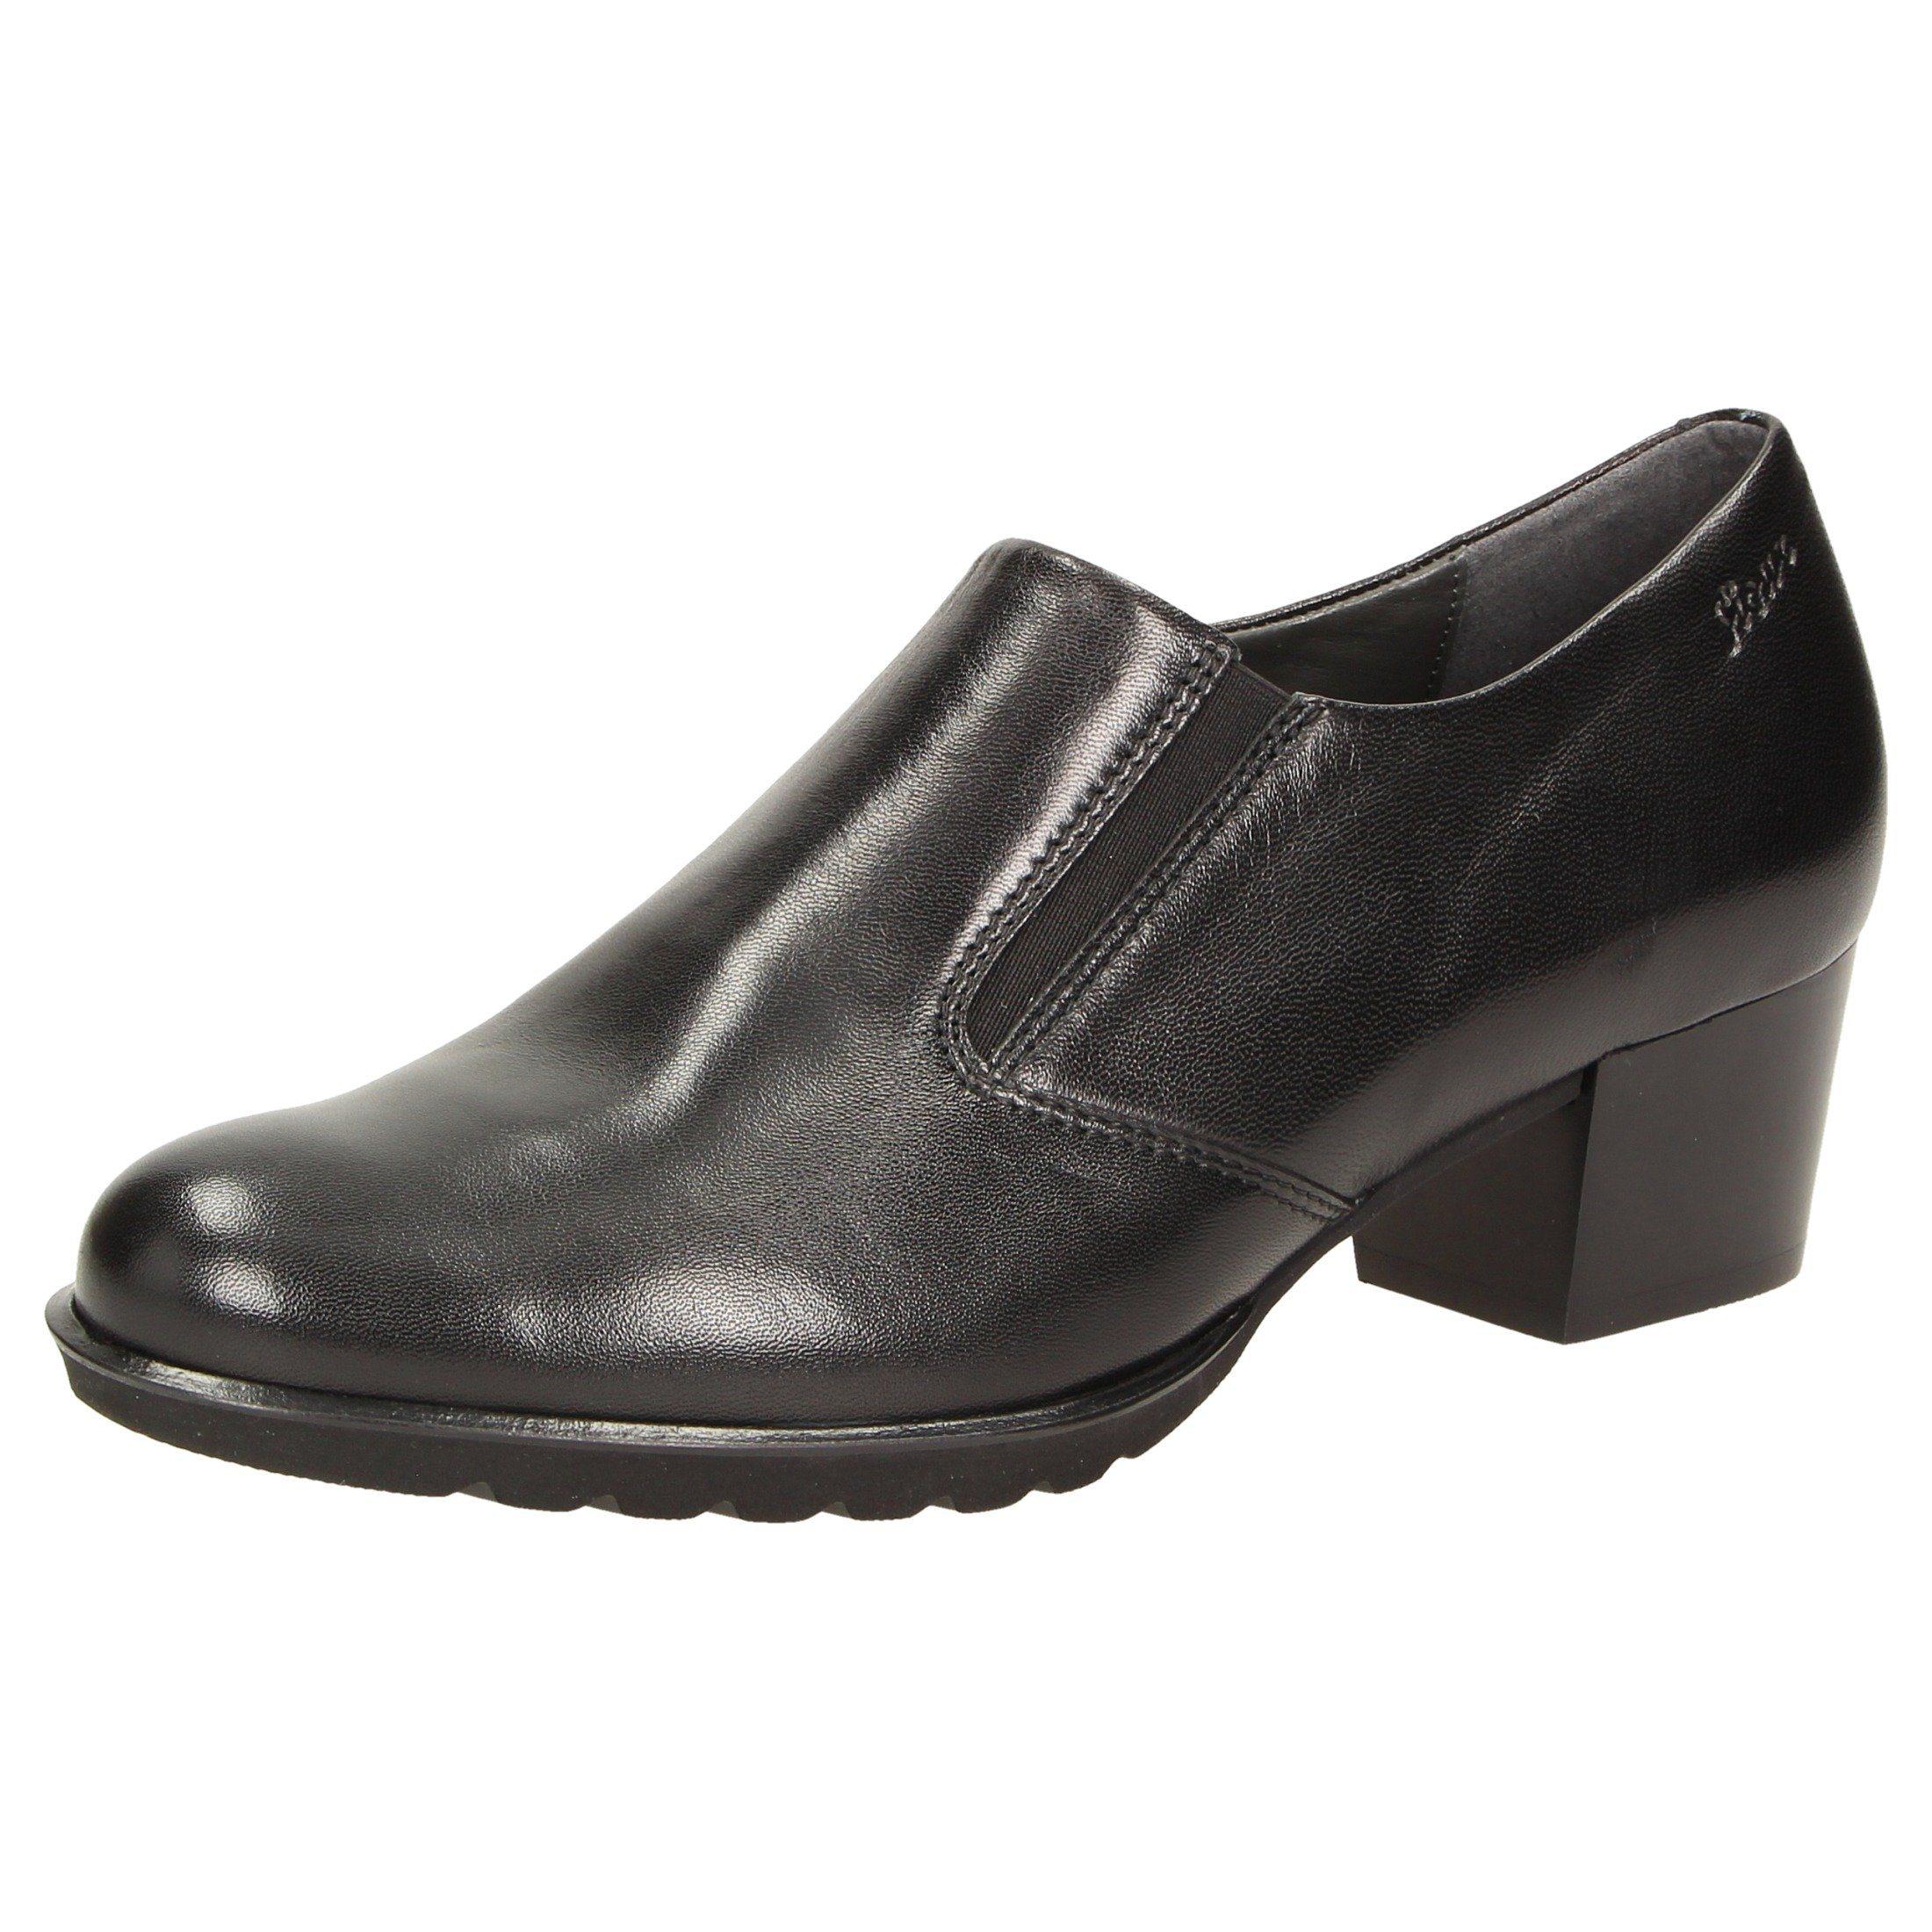 SIOUX Hochfrontpumps Zairida-700-XL | Schuhe > Pumps > Hochfrontpumps | Schwarz | Sioux